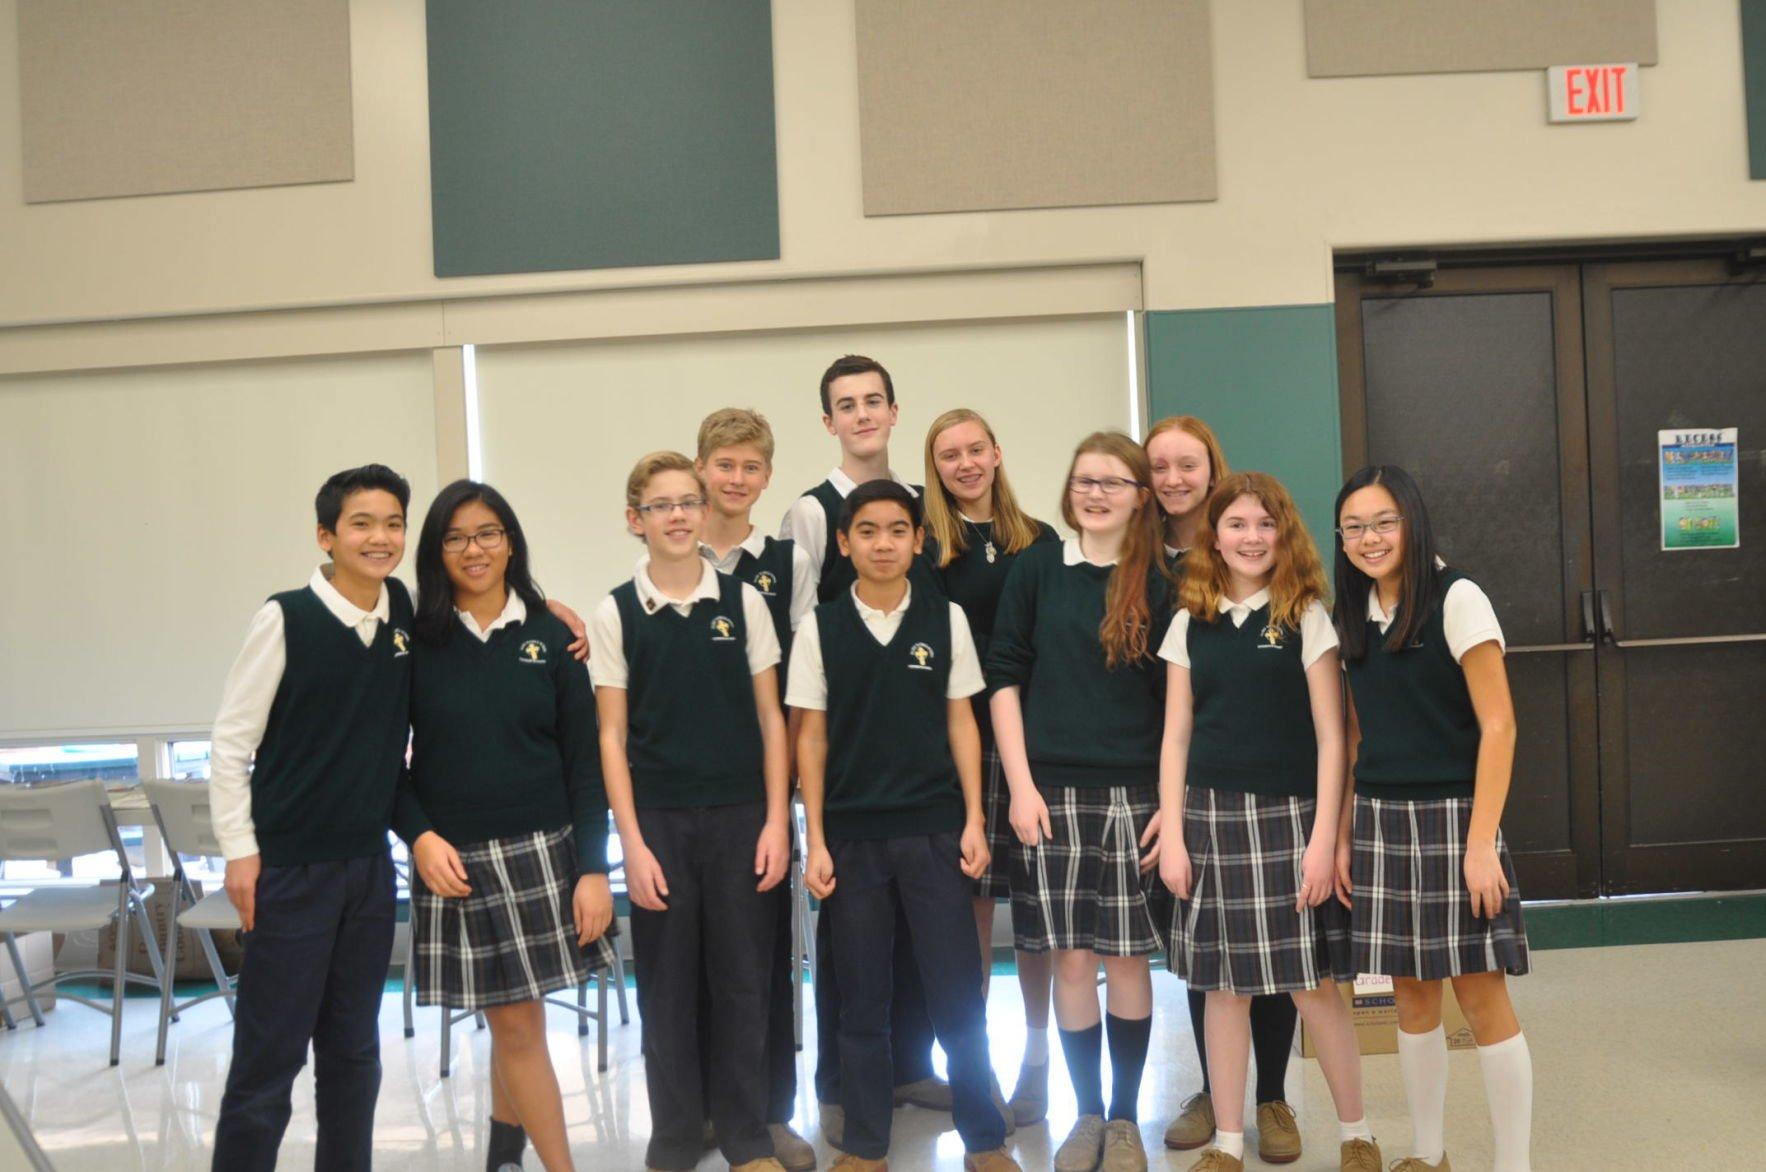 Saint Patrick School